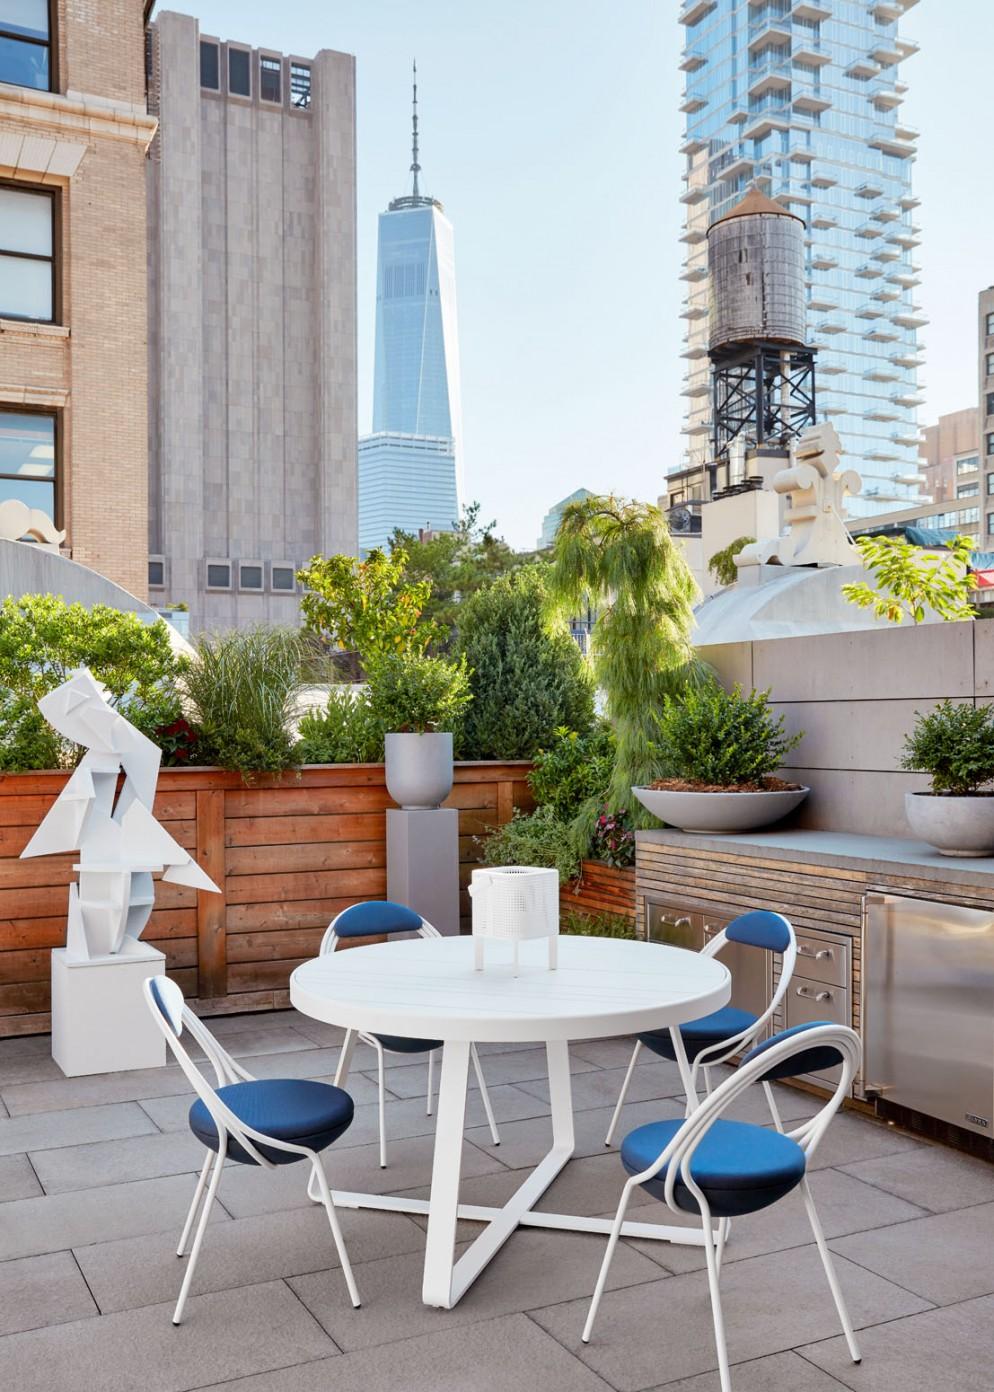 01 Top Gallery NYC_Casa Lee Broom